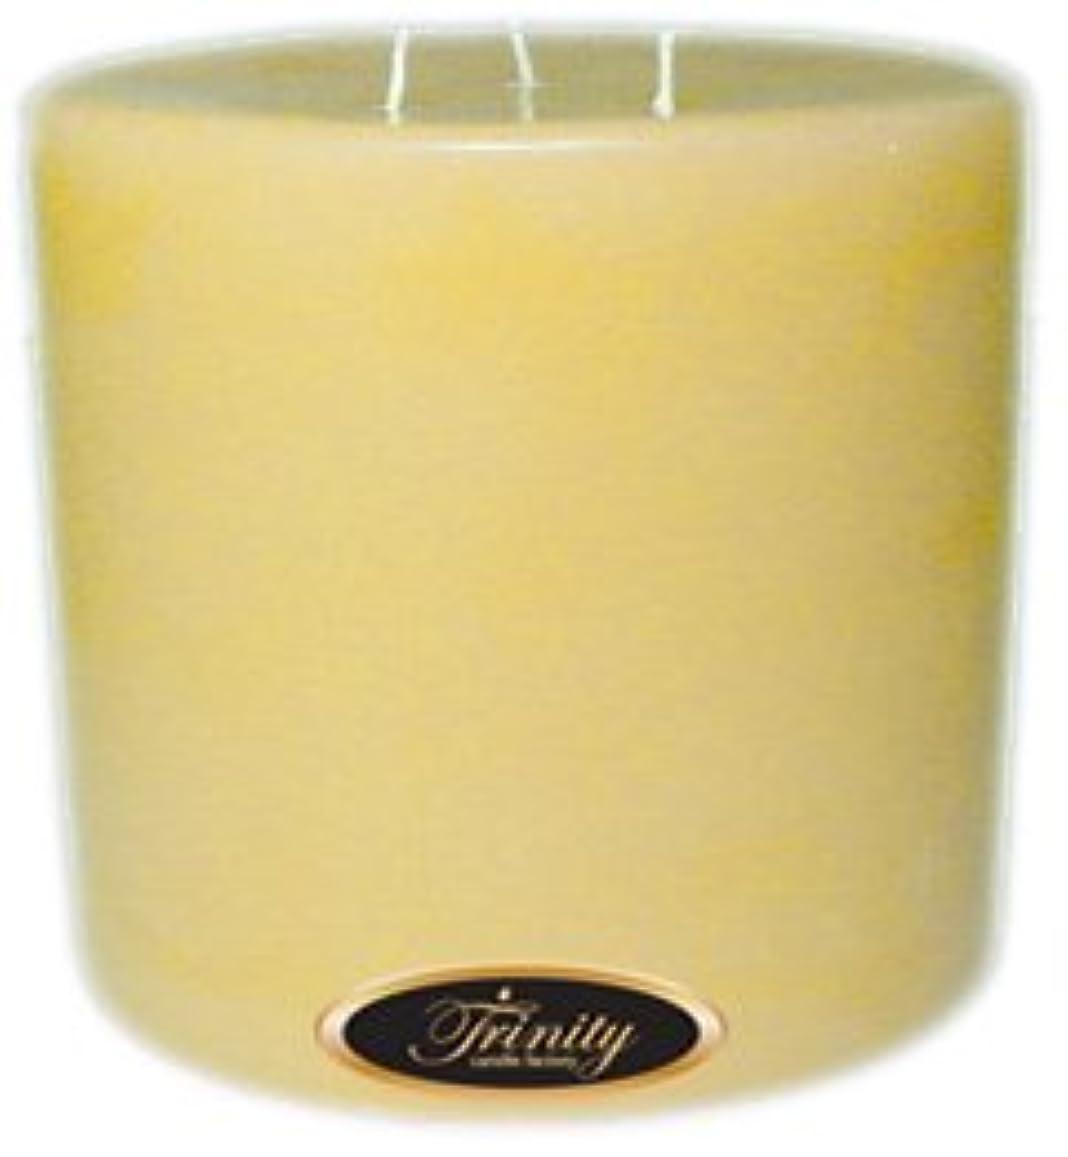 Trinity Candle工場 – Almond Bark – Pillar Candle – 6 x 6